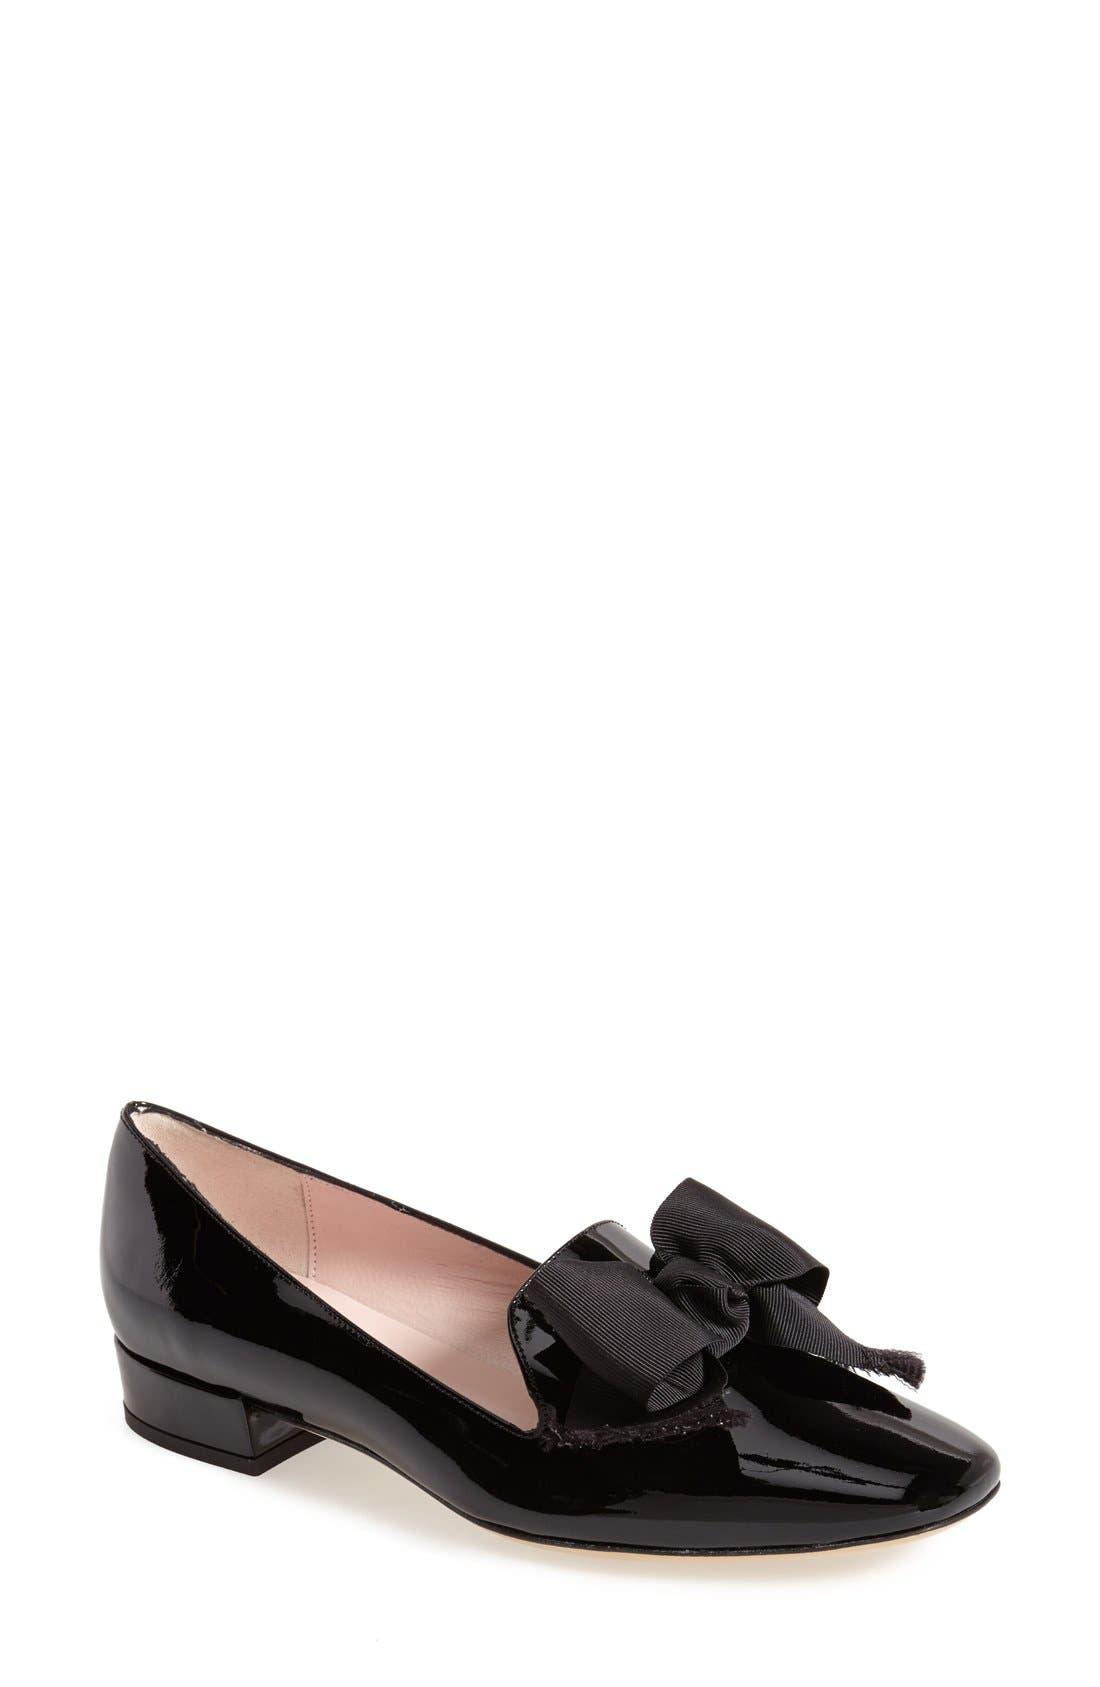 kate spade new york 'gino' loafer (Women)